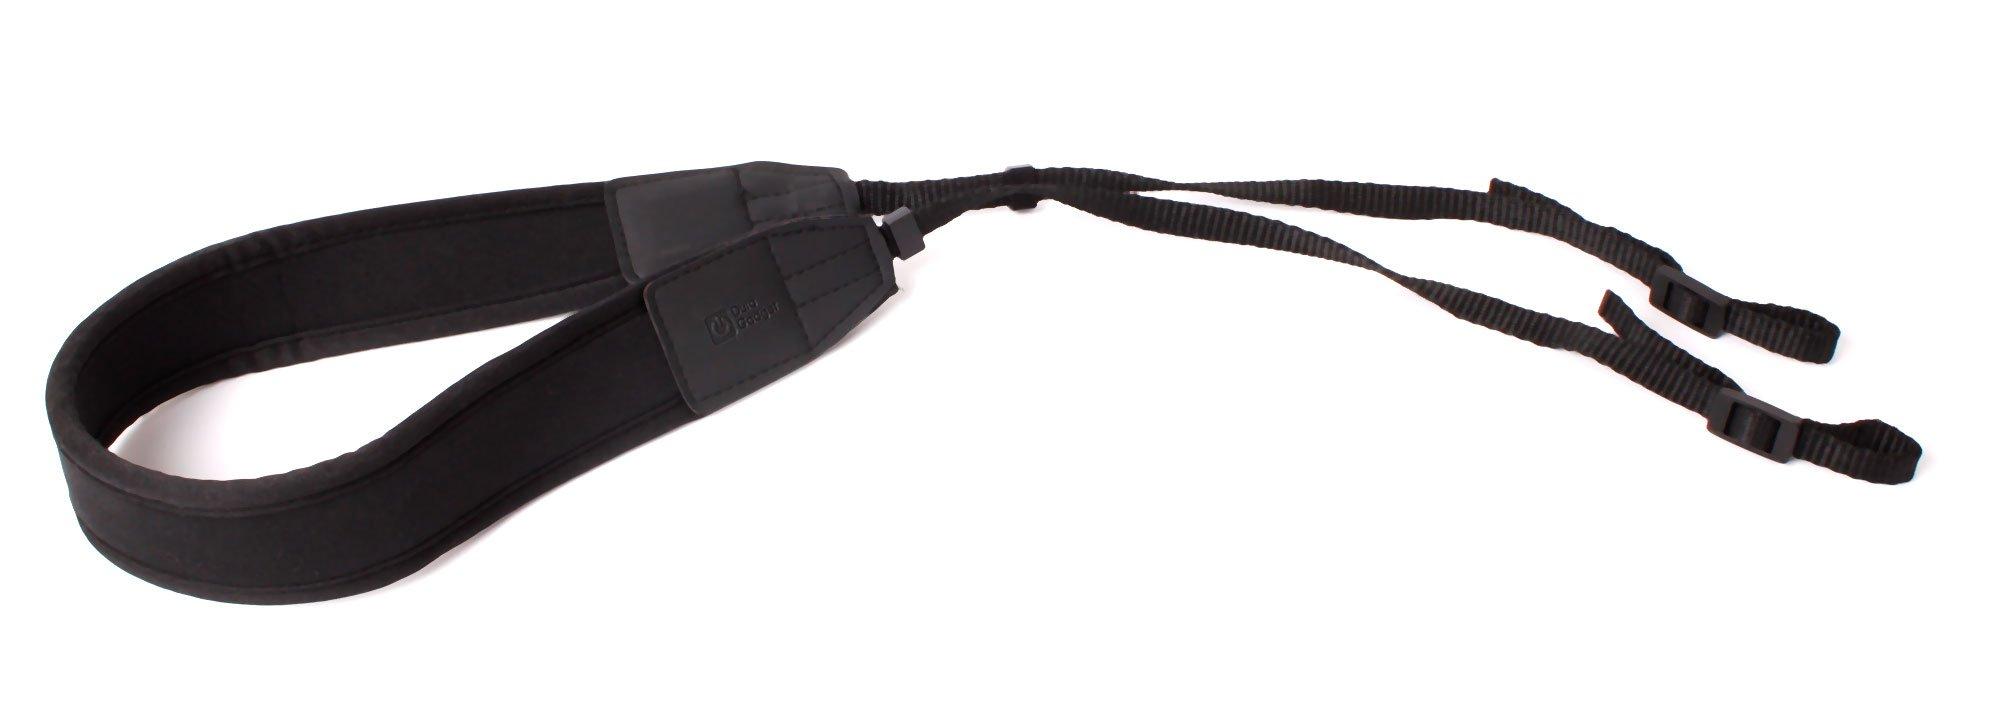 DURAGADGET Adjustable Neck Strap For Sony Digital SLR Cameras - Black